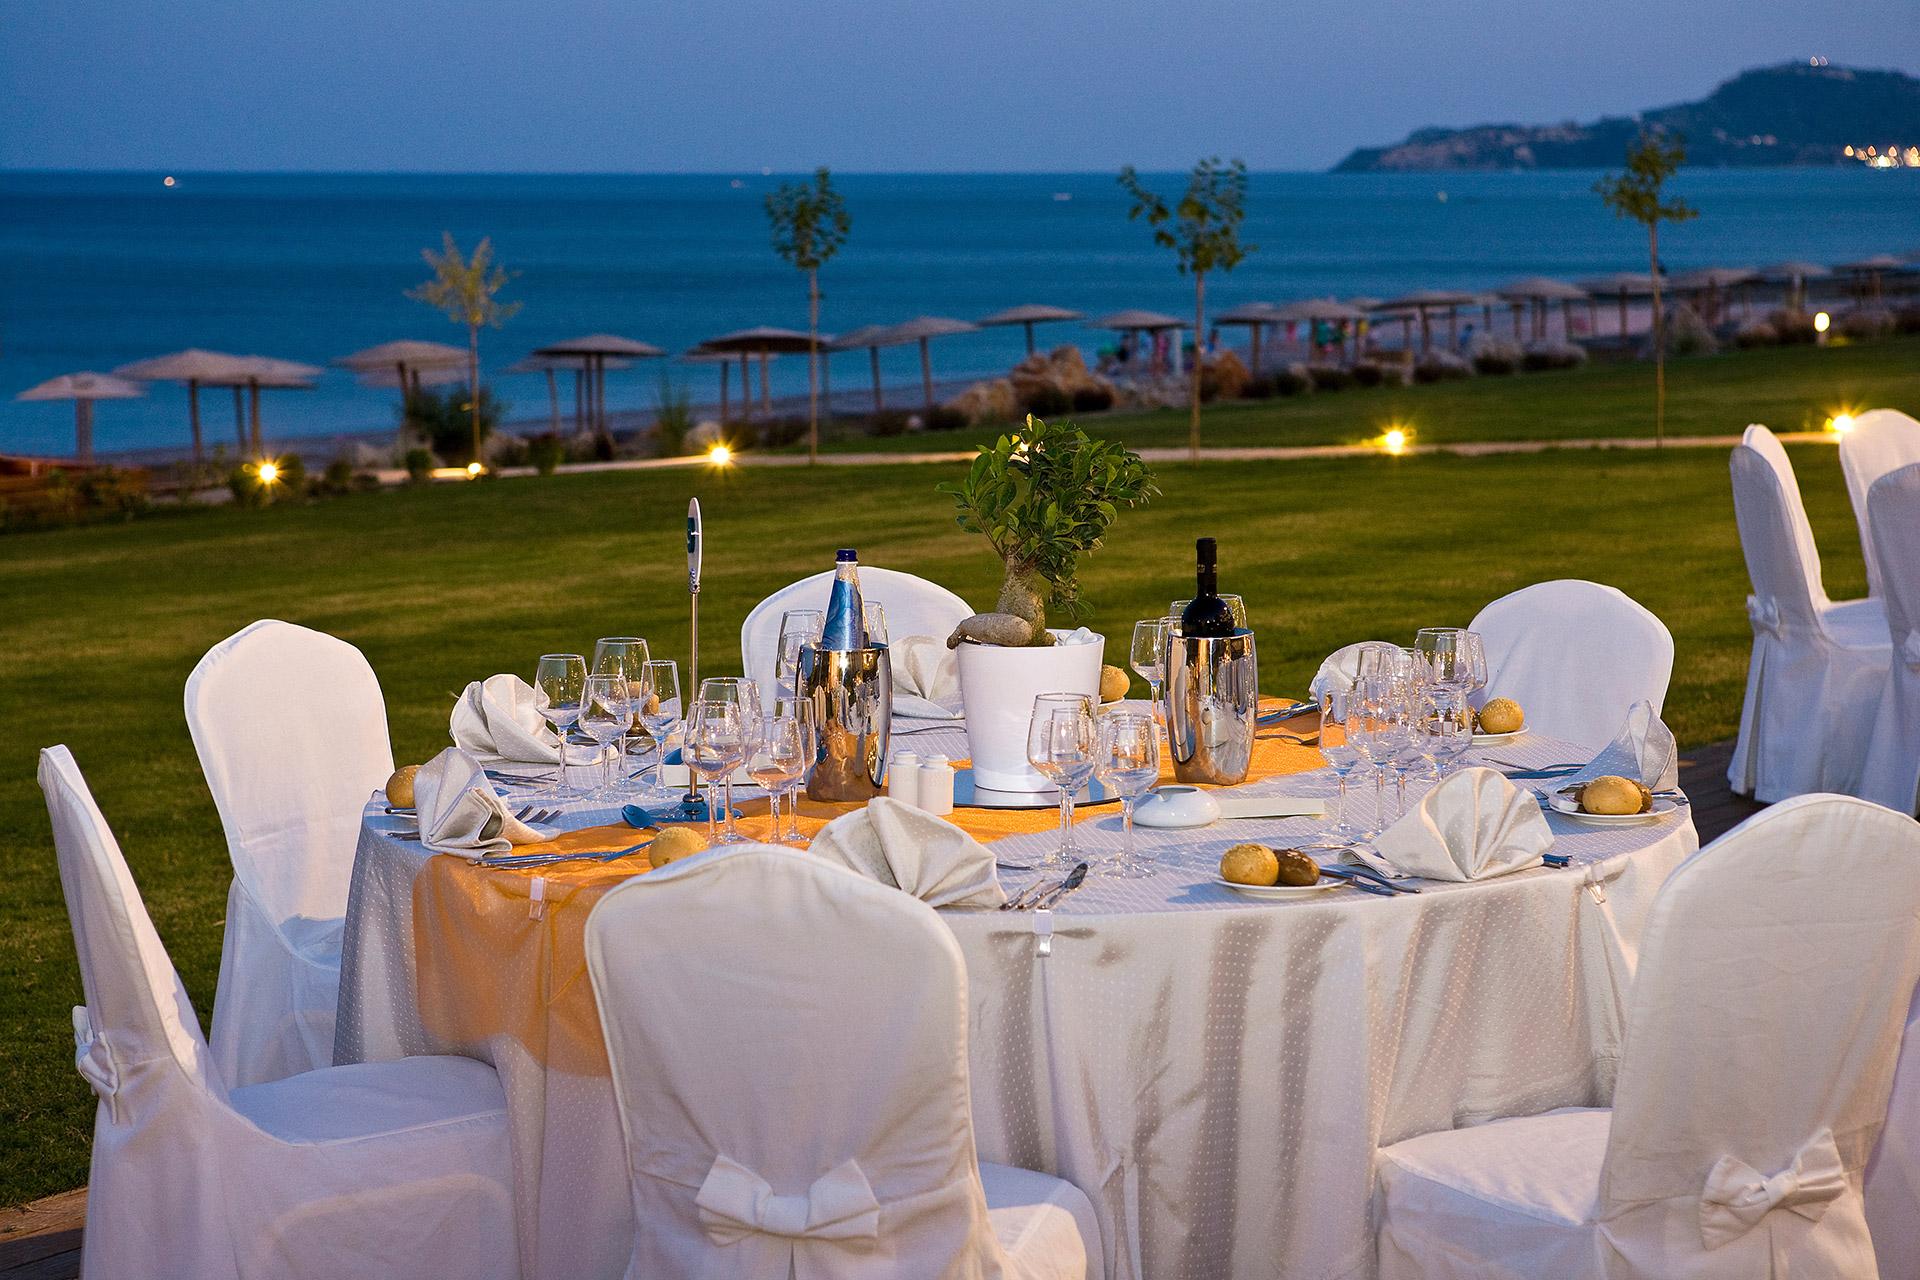 905_outdoor_banquet_elysium